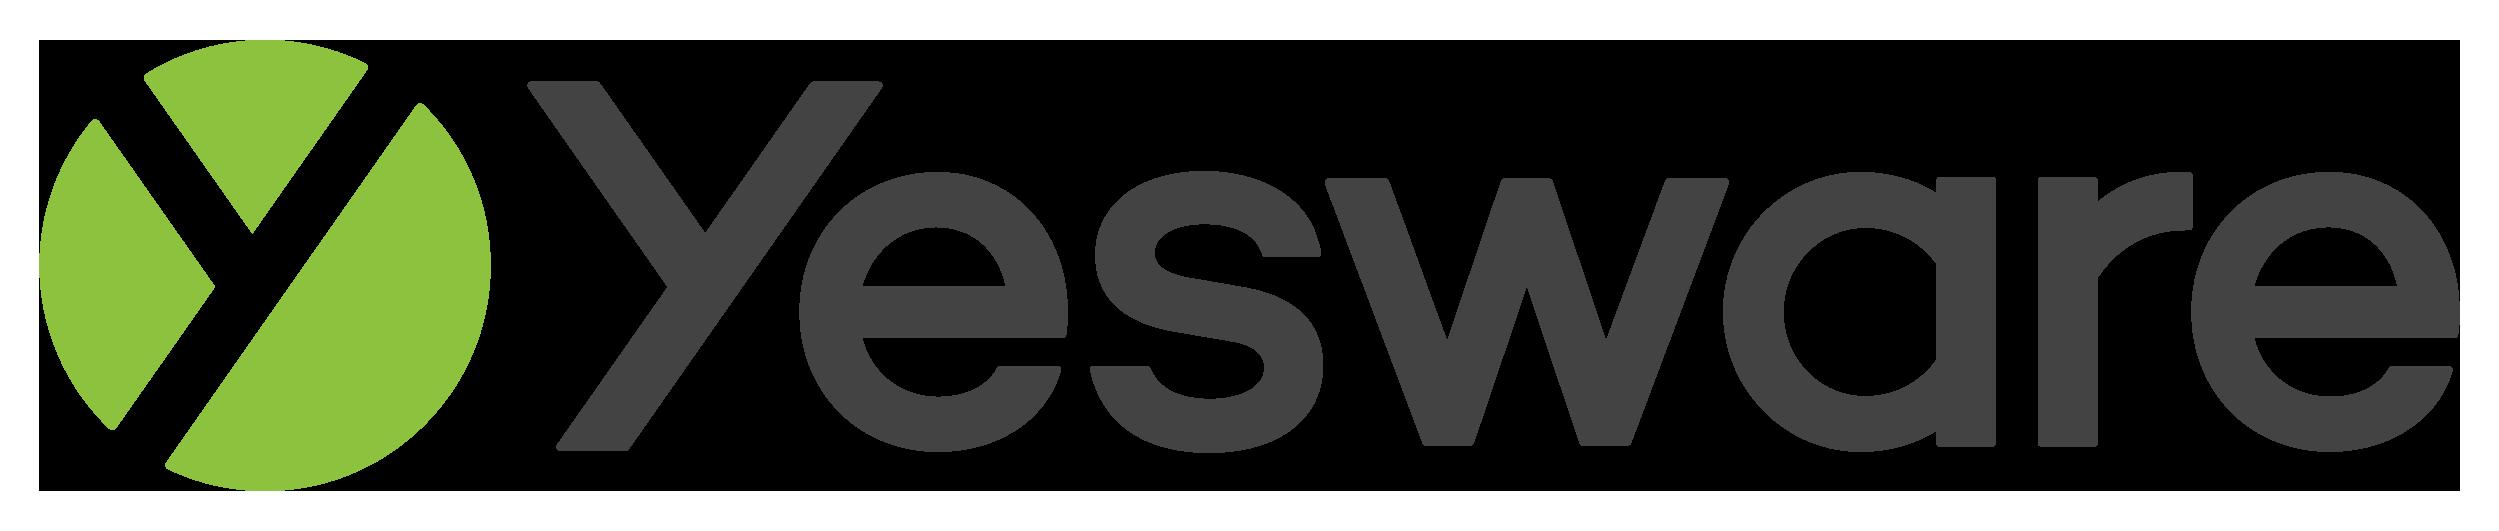 yesware logo png